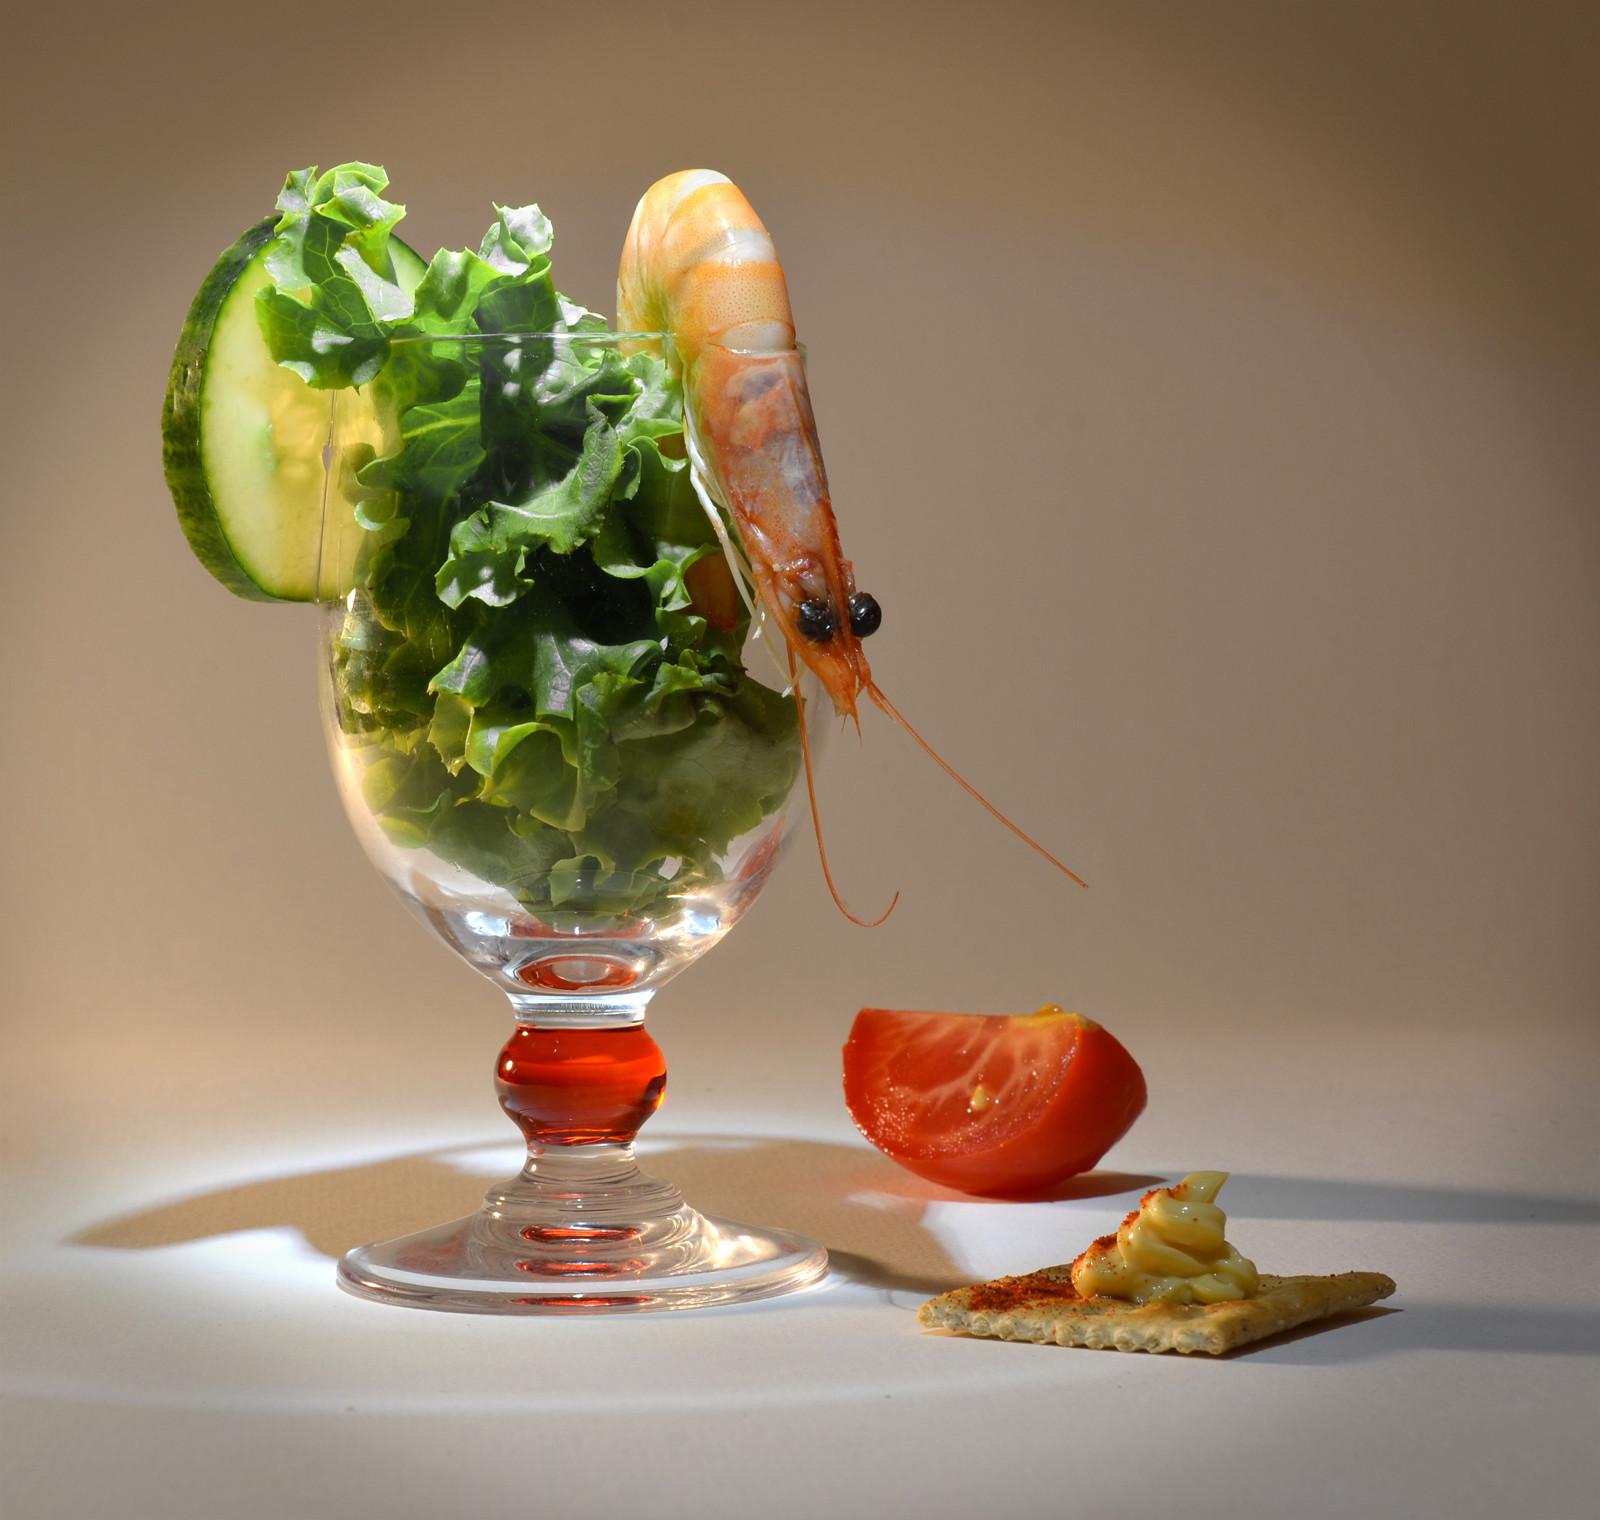 PDI - Hungry prawns by Kathy Stewart (undefined marks)